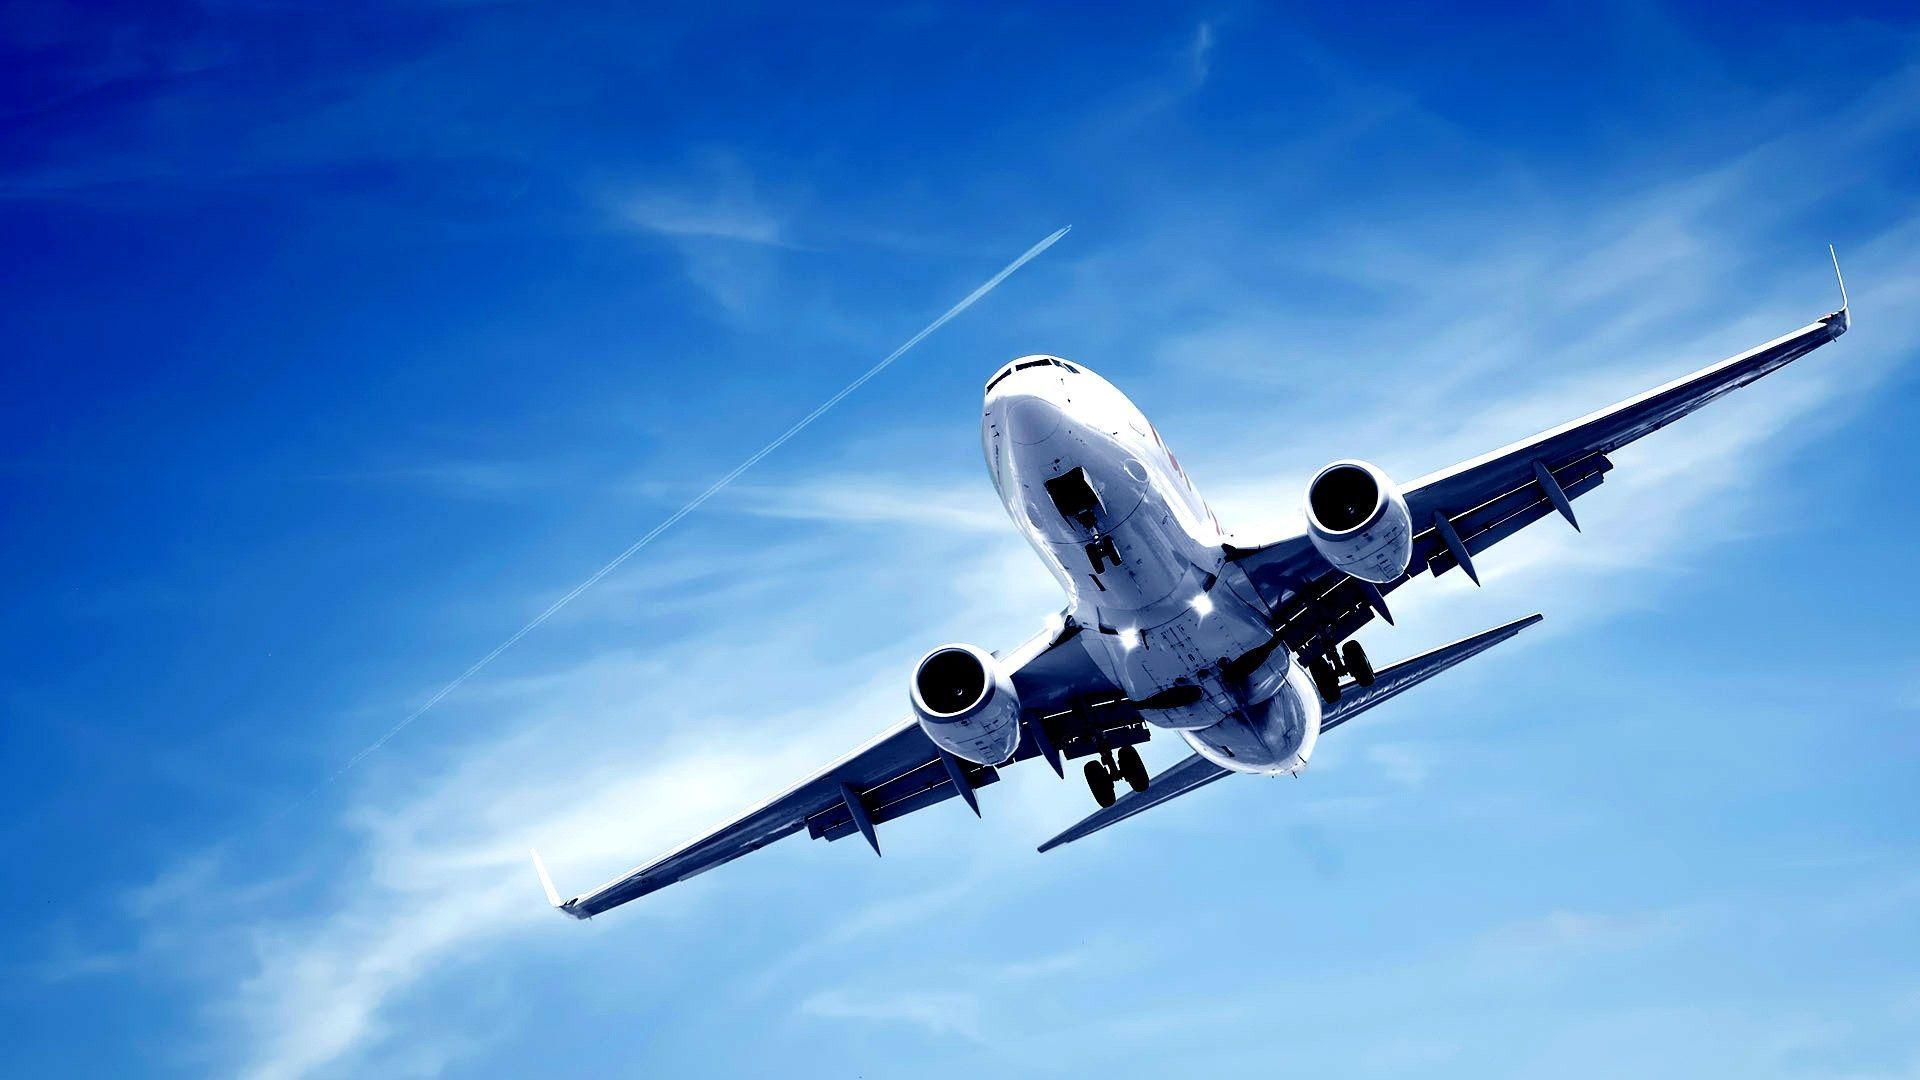 самолет вид снизу